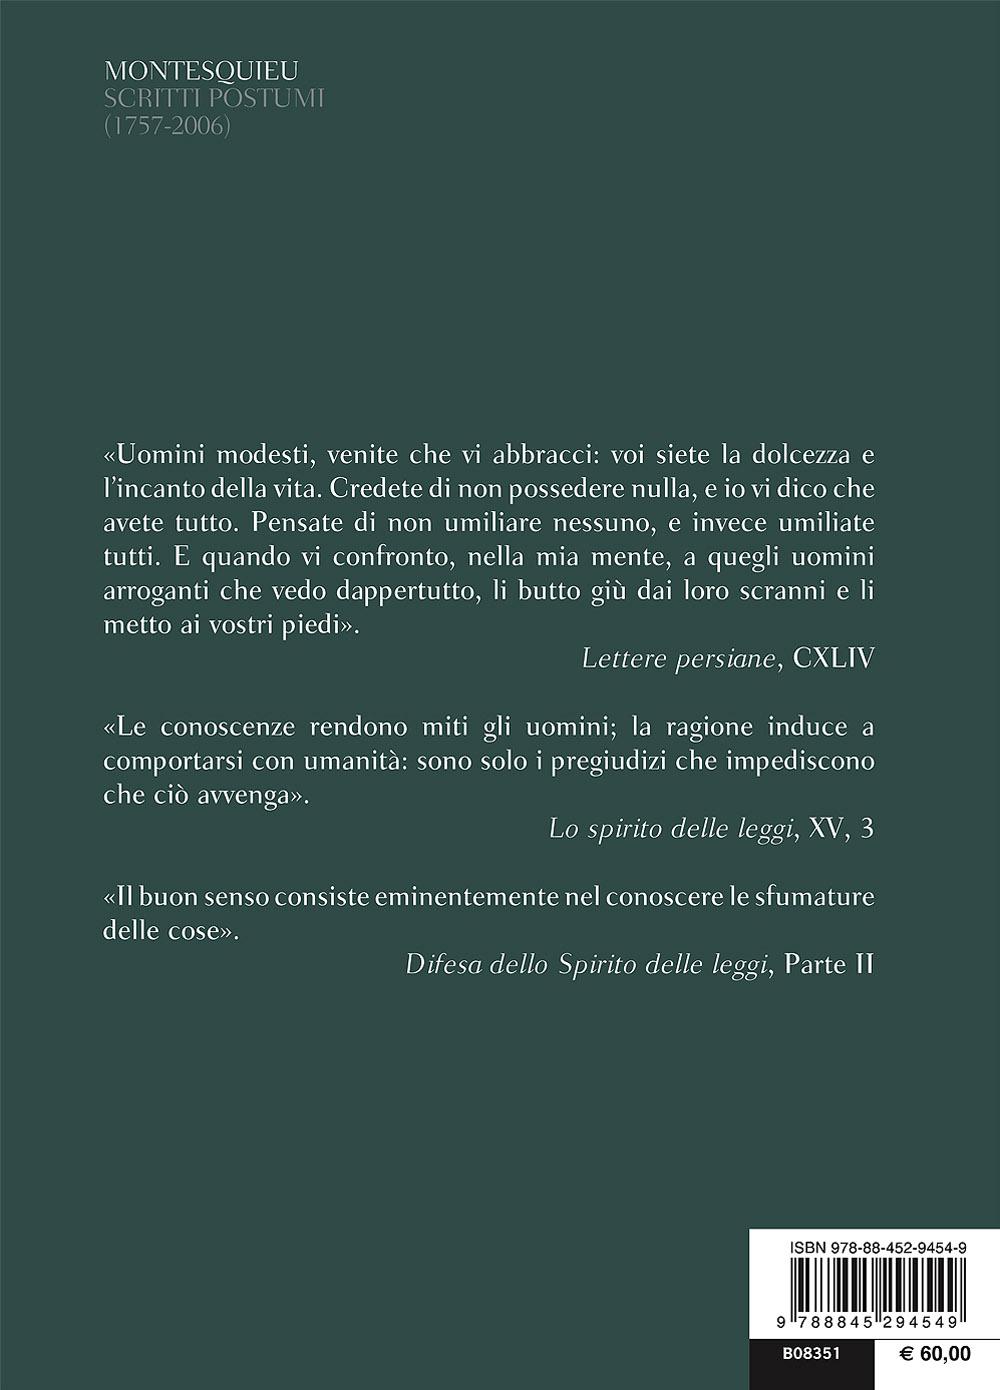 Scritti postumi (1757-2006)